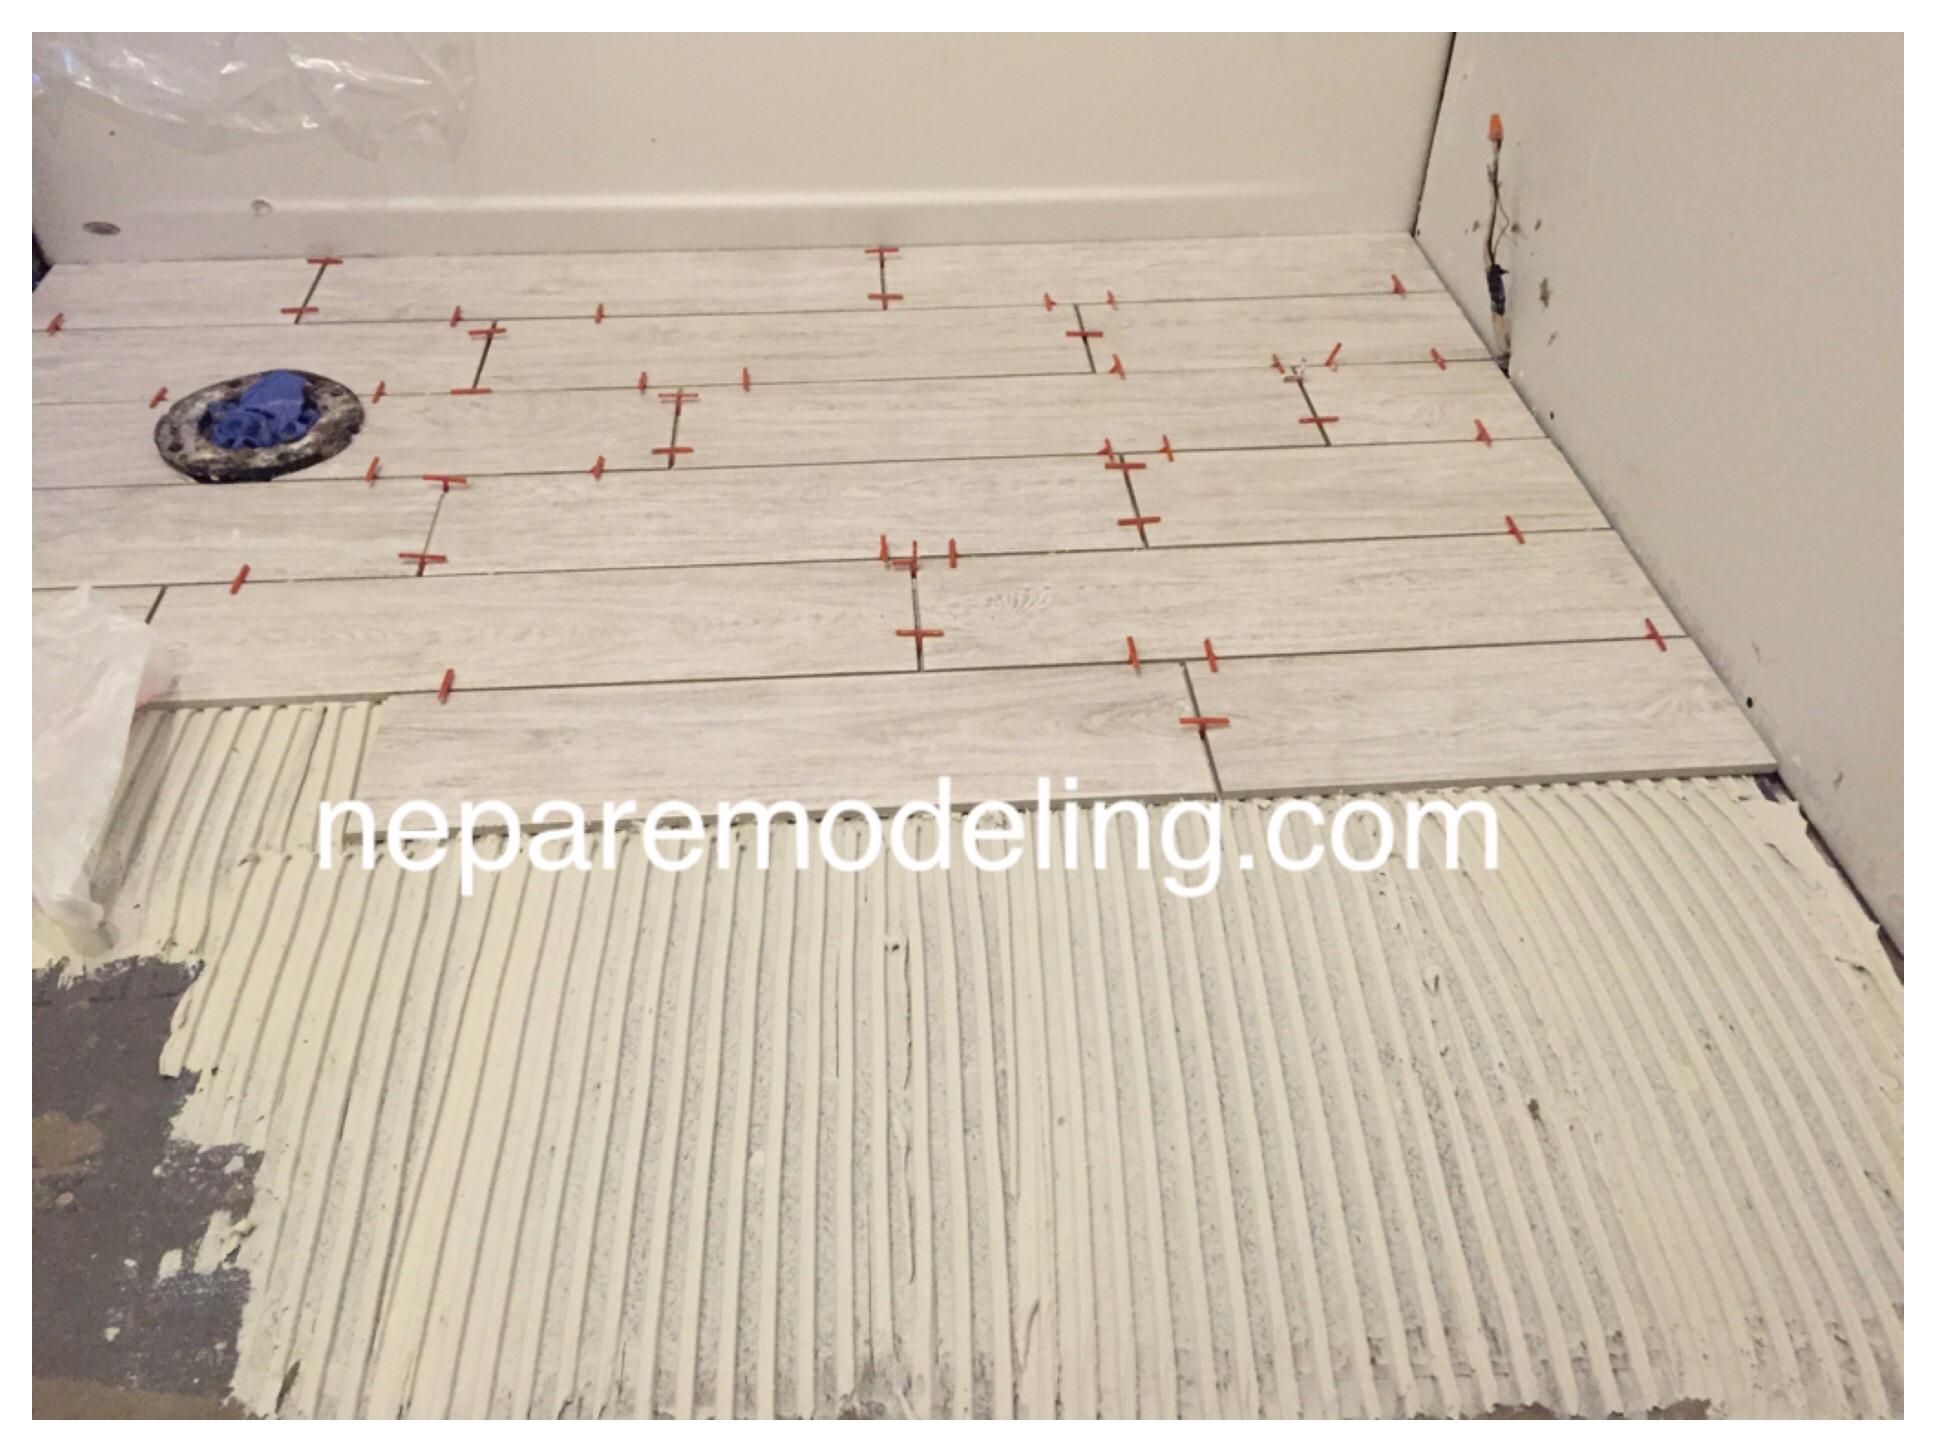 "6""x24"" porcelain floor tile installation."